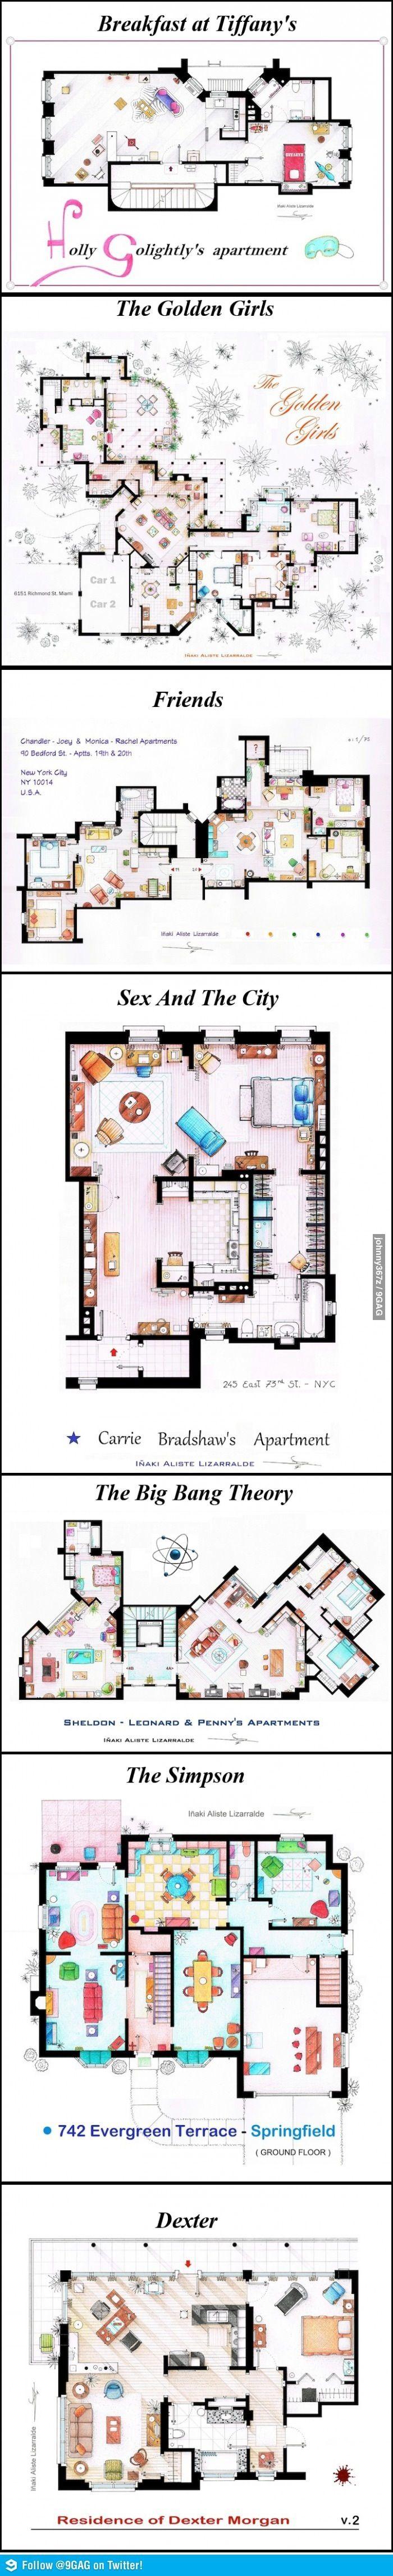 87 Tv Show Floor Plans Ideas Floor Plans How To Plan House Floor Plans